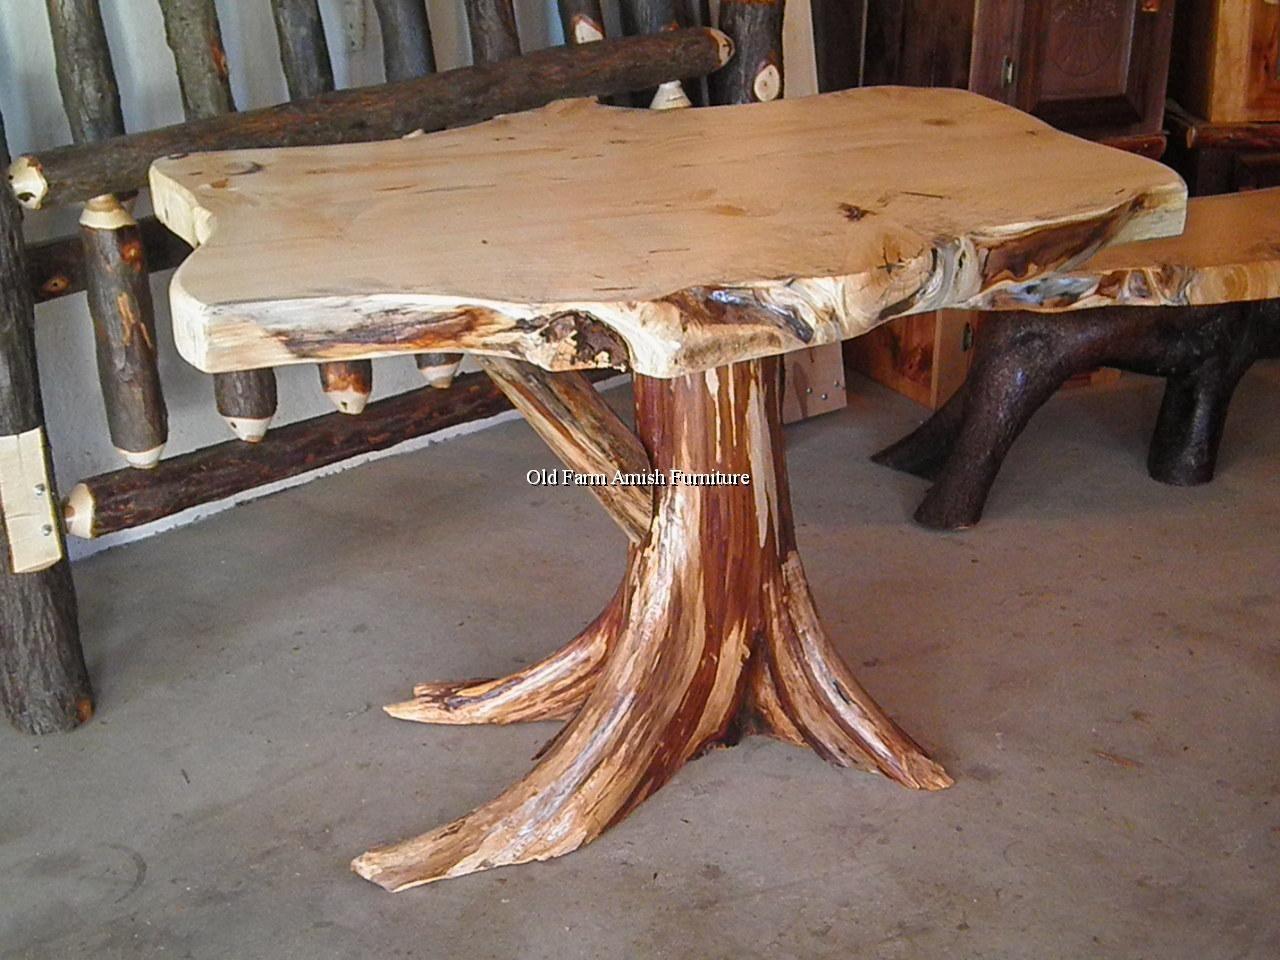 Peeled Cedar Stump With Pine Slab Top Tree Trunk Or